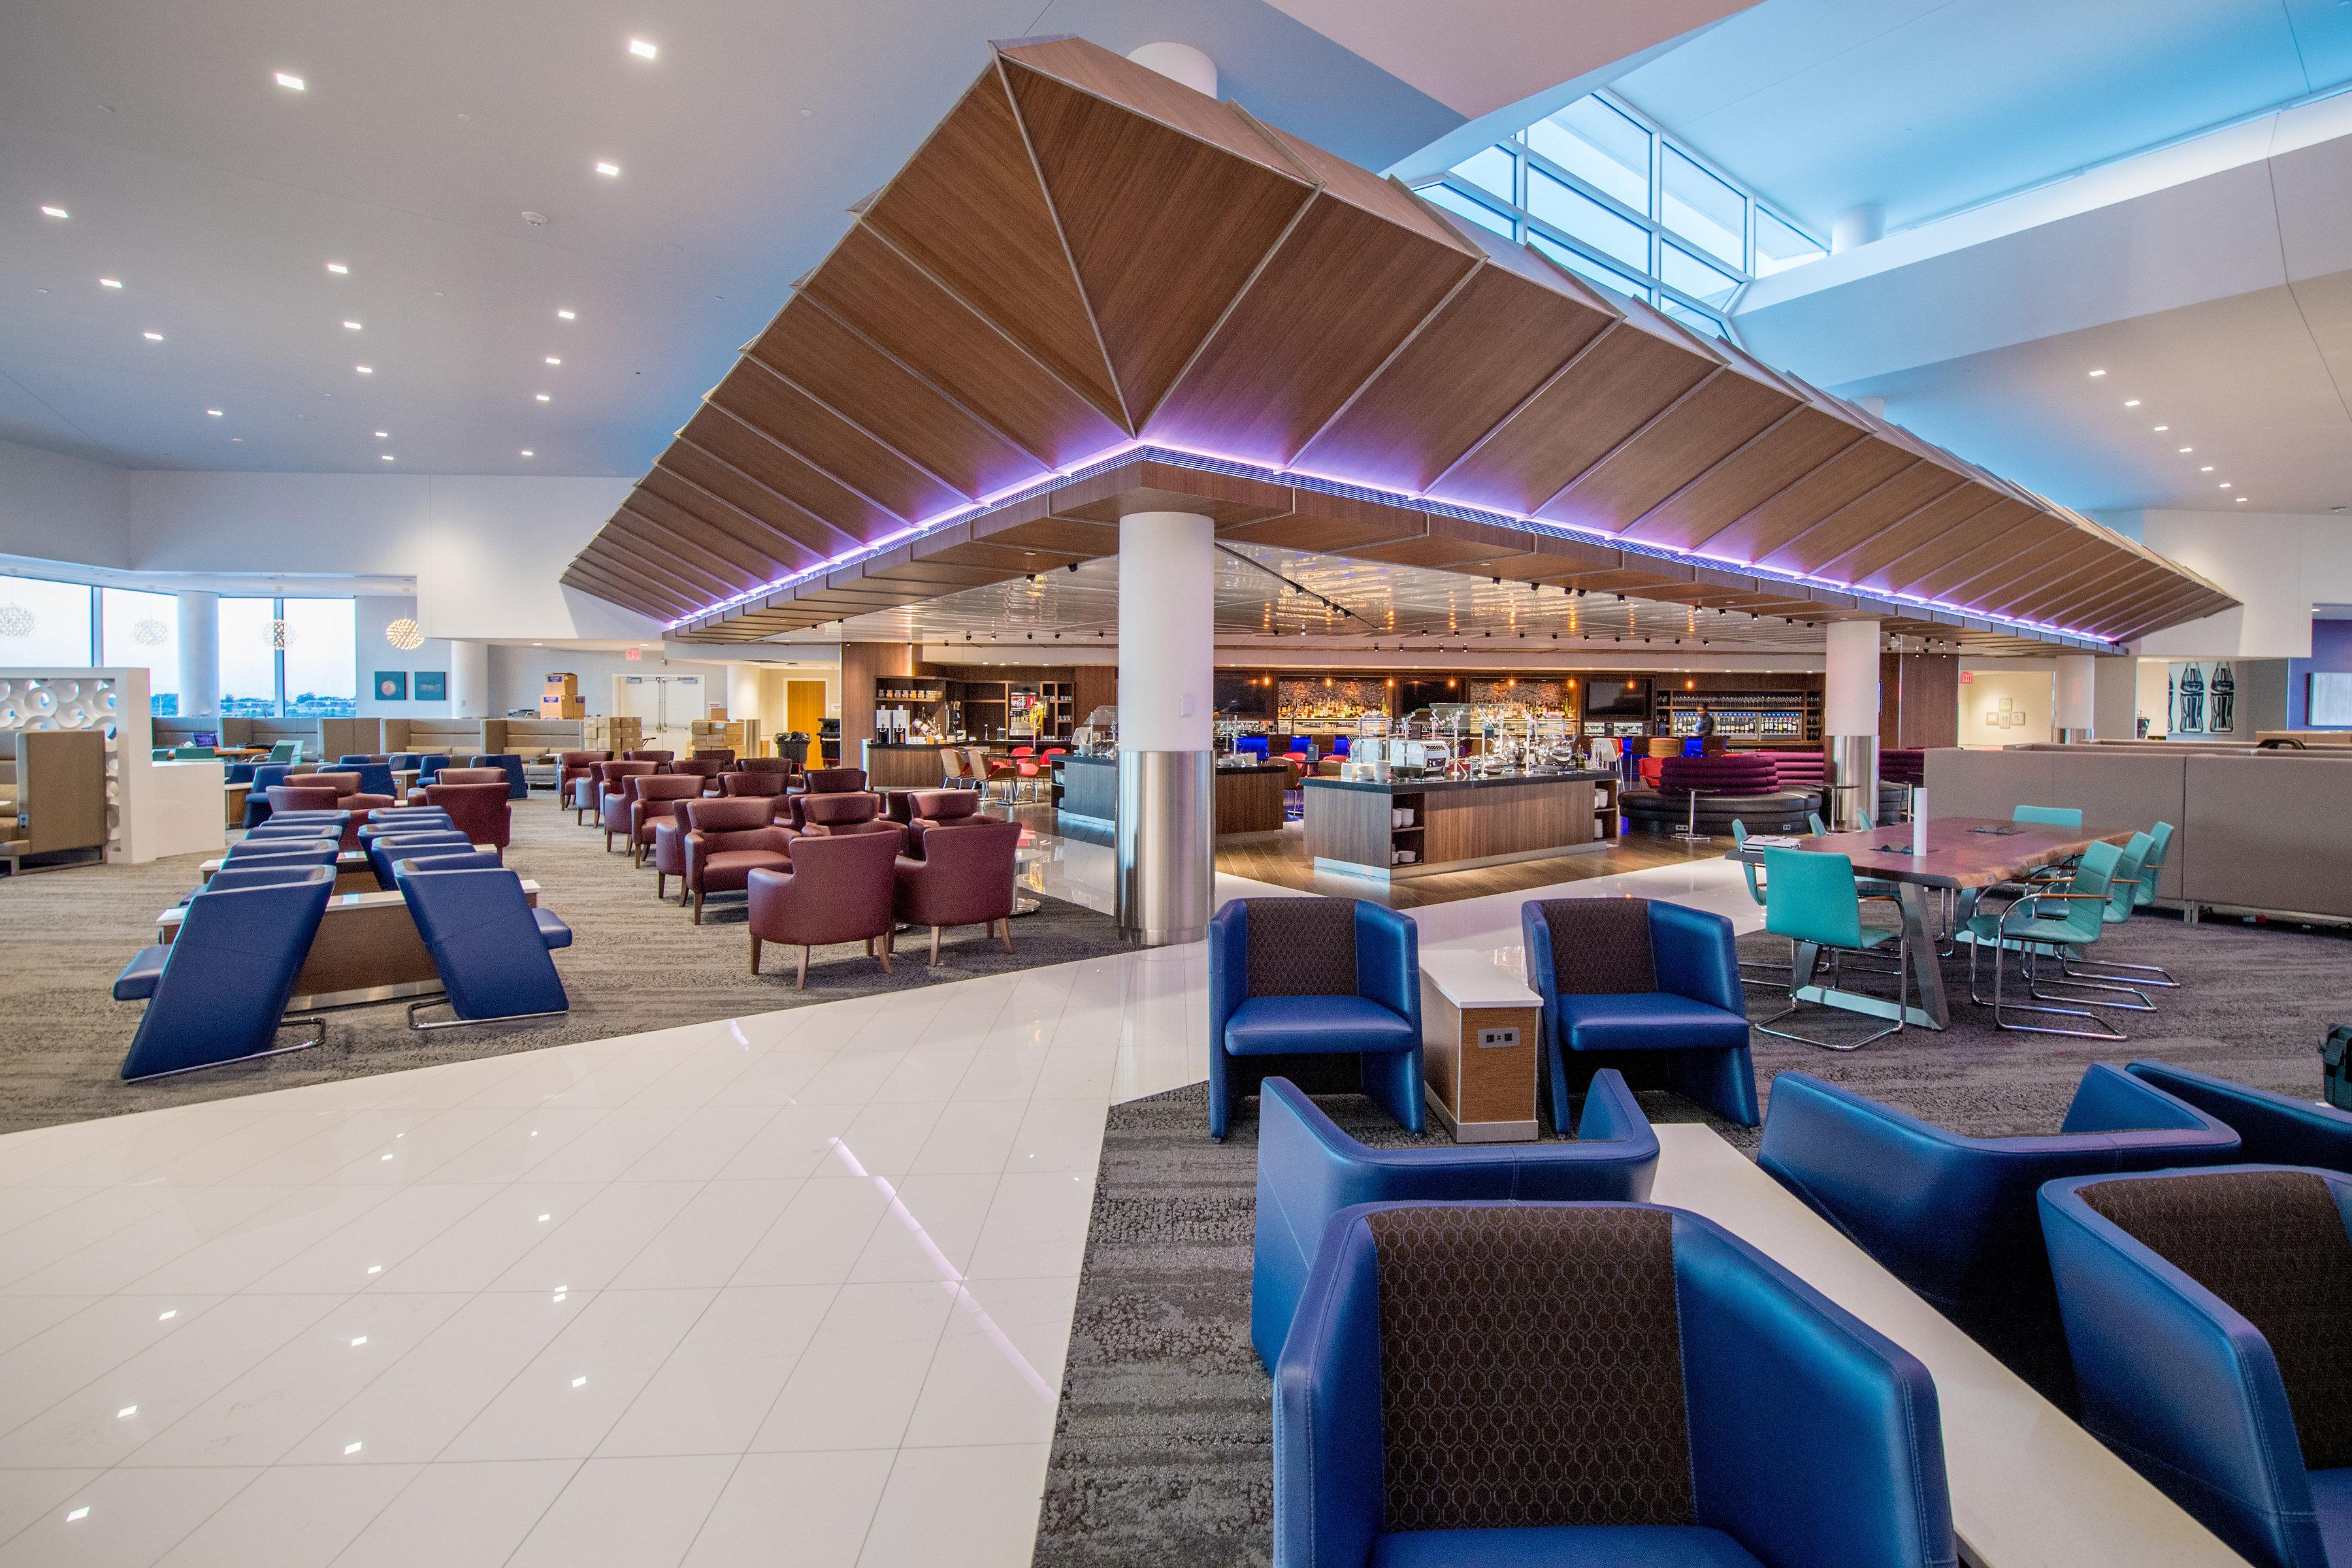 Delta Inaugura Delta Sky Club Insignia En La Terminal B De